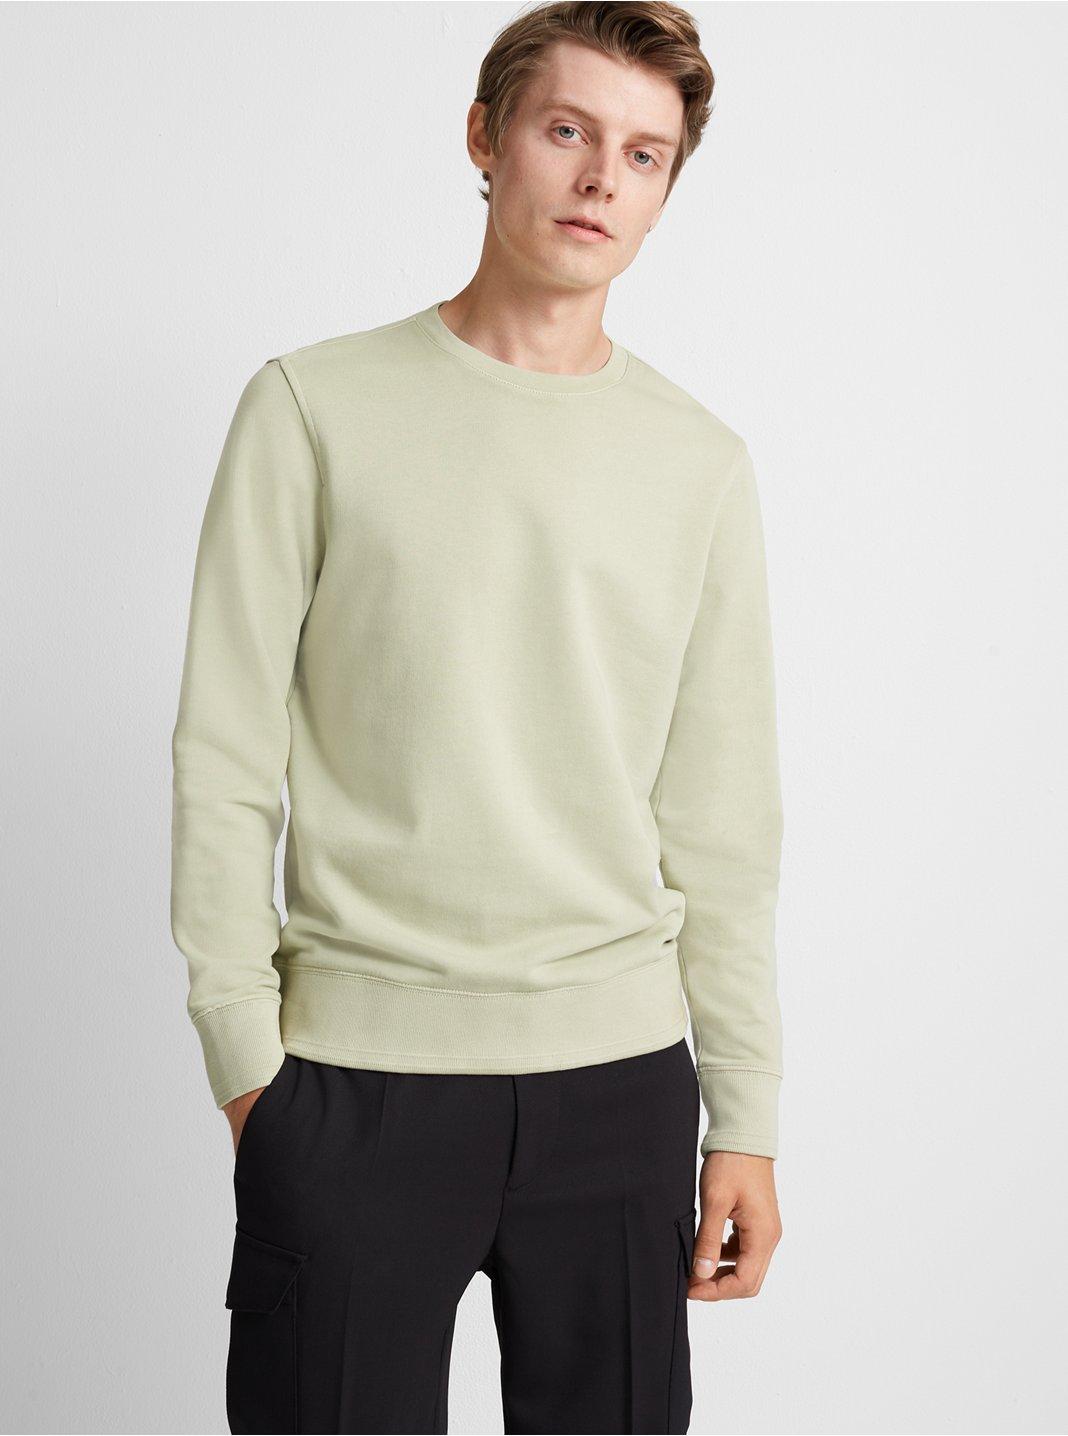 Ottoman Trim Sweatshirt